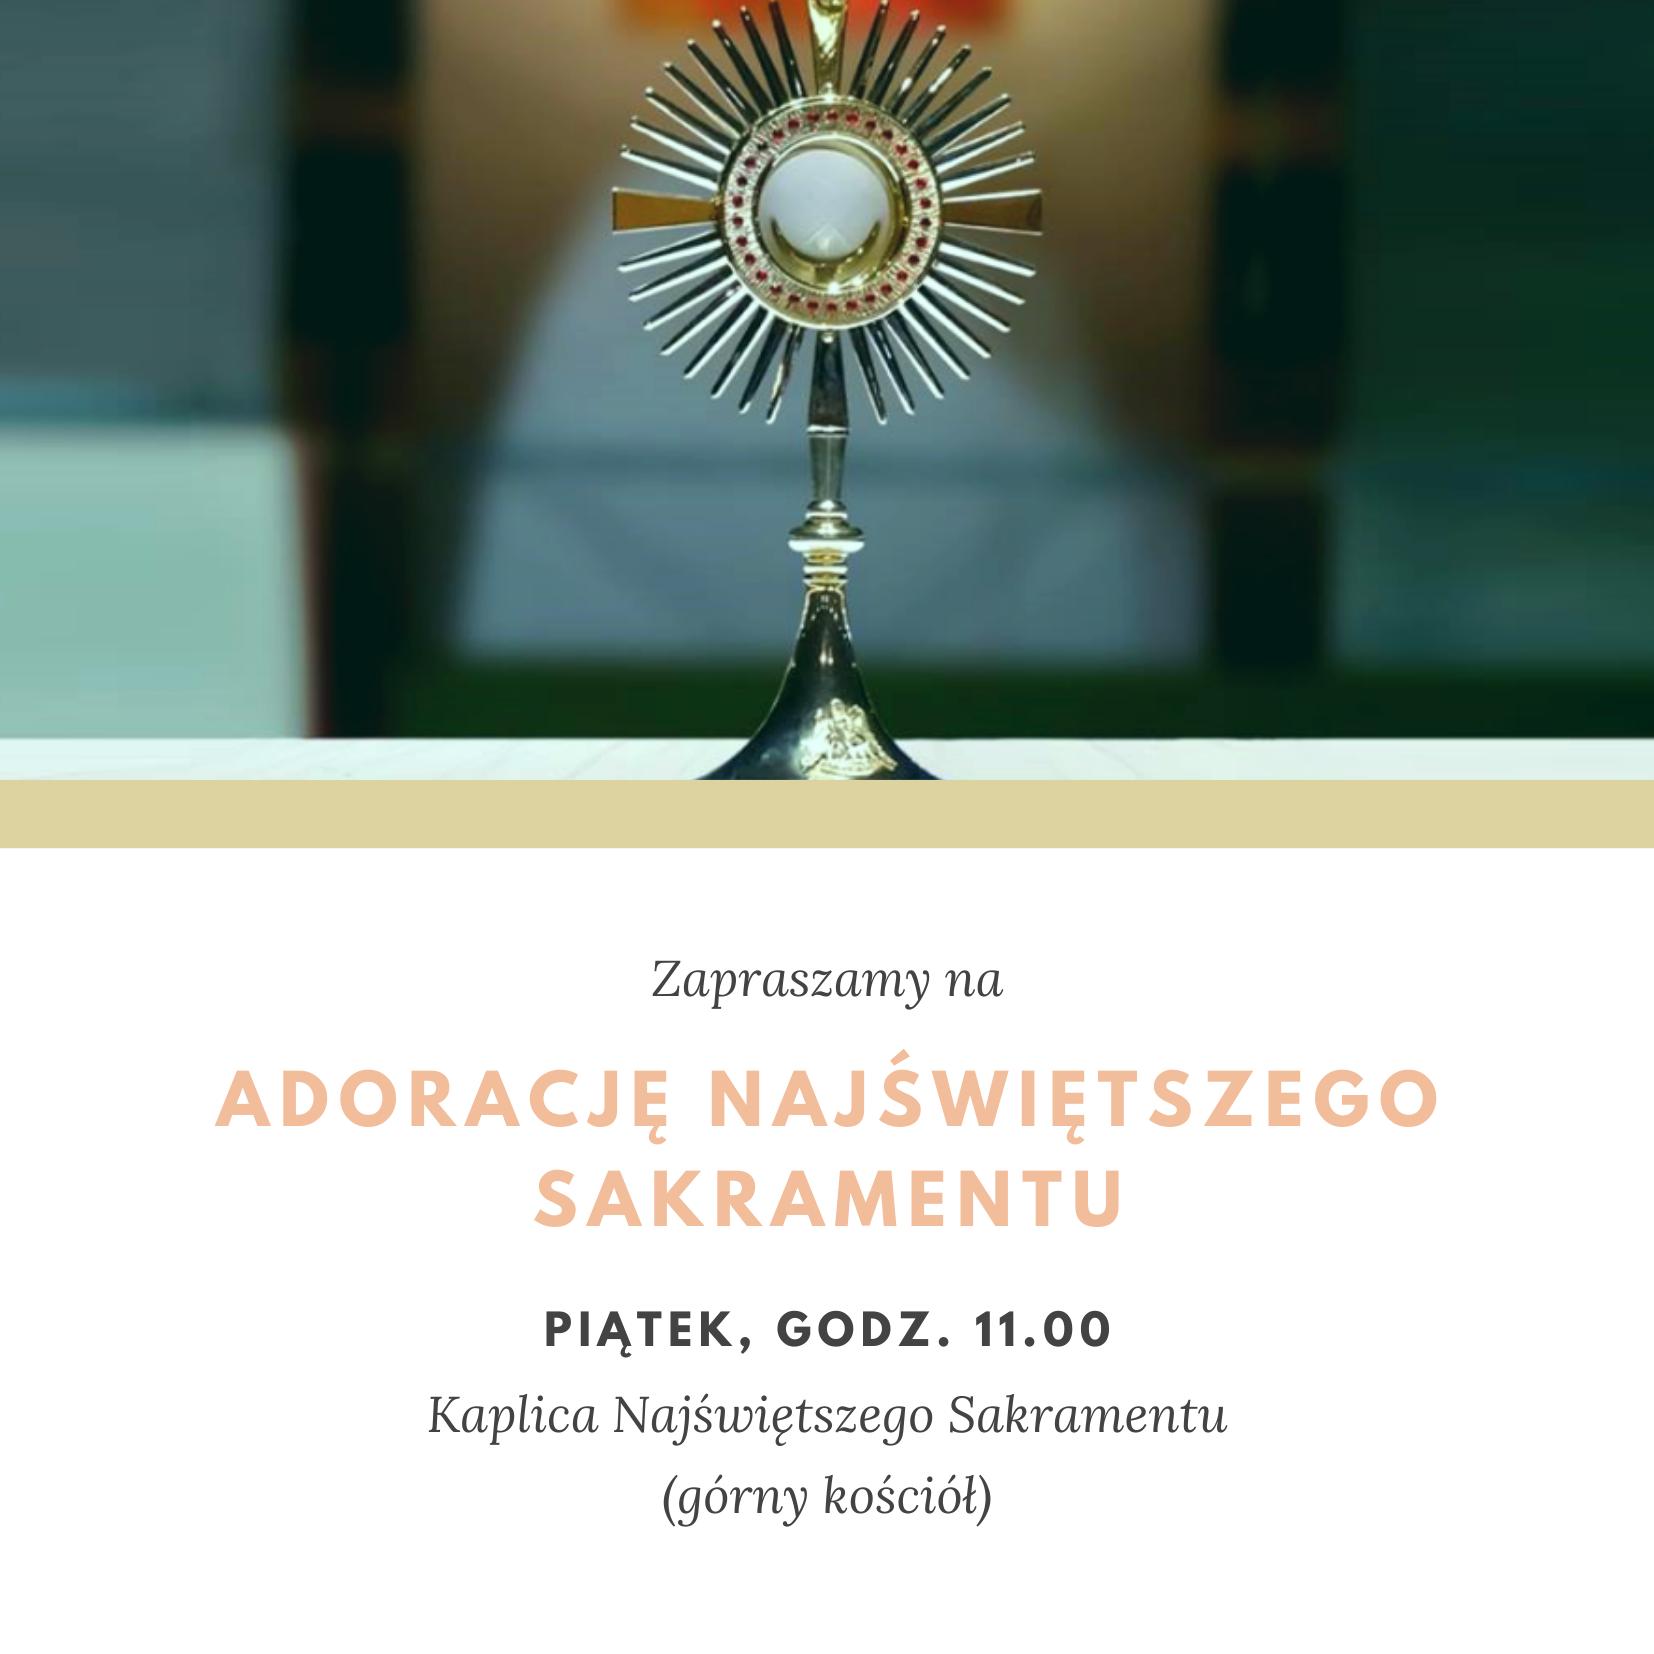 Katoliccy Single - Strona gwna | Facebook